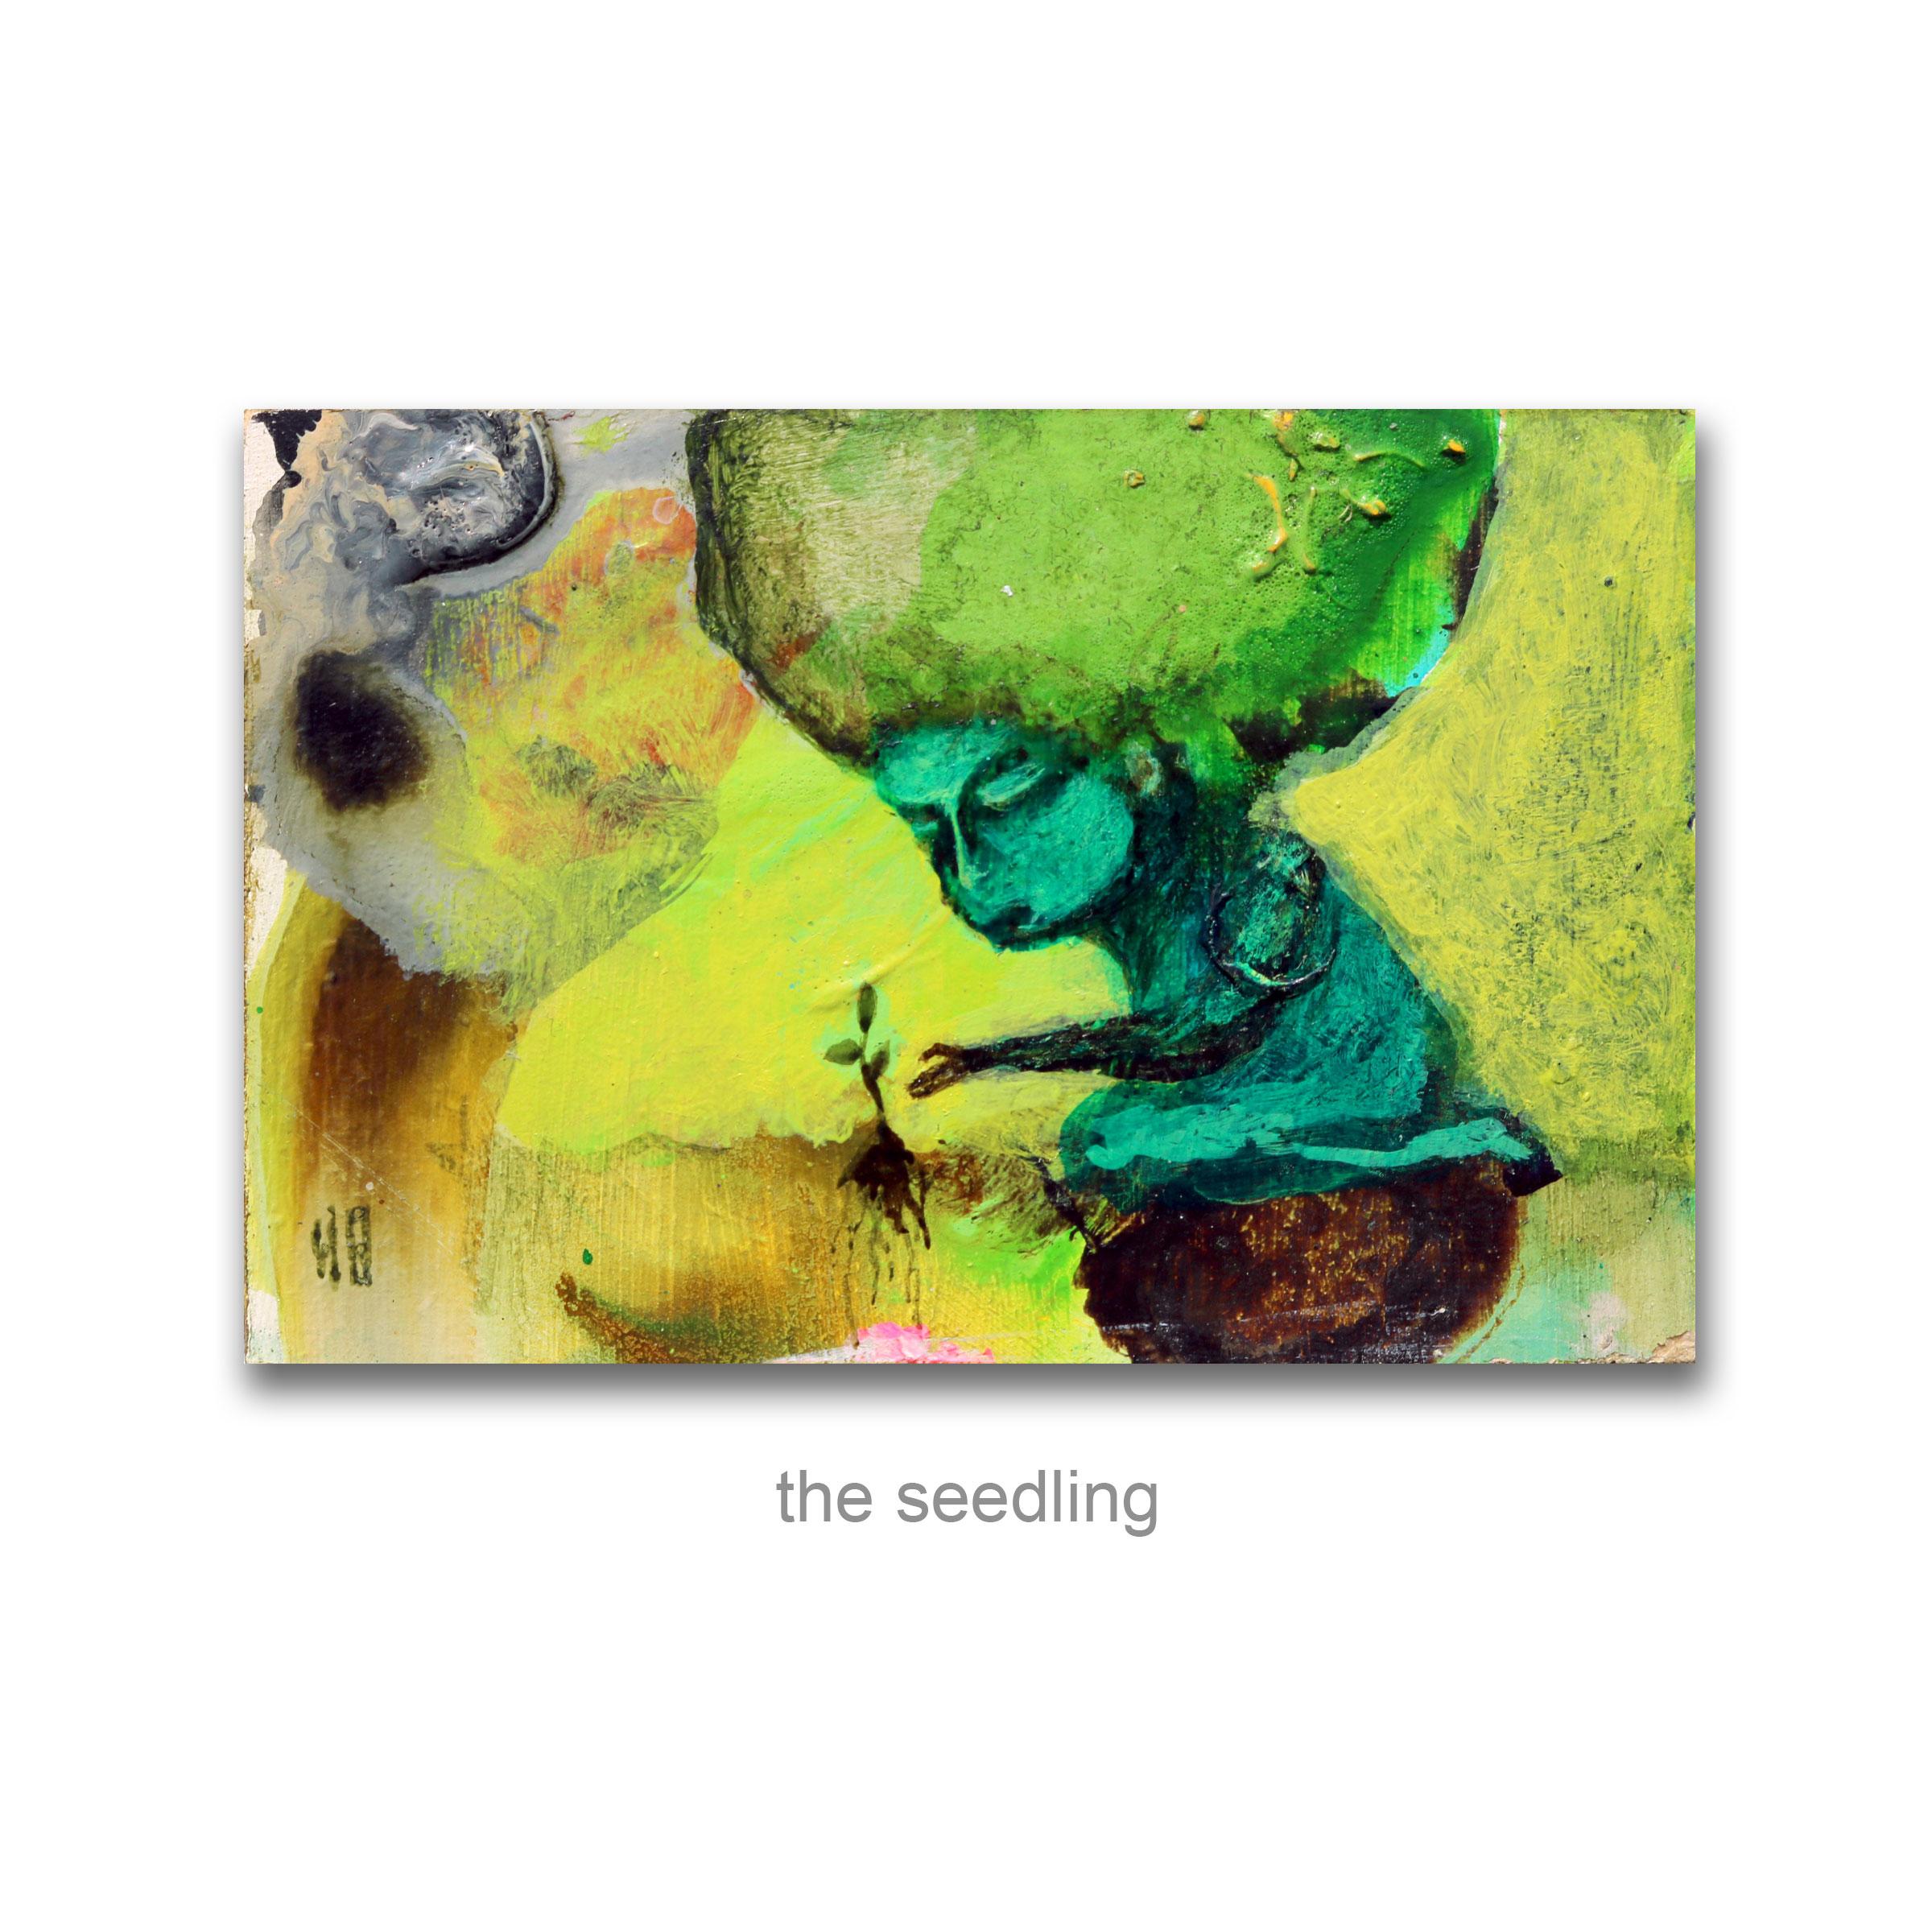 the-seedling